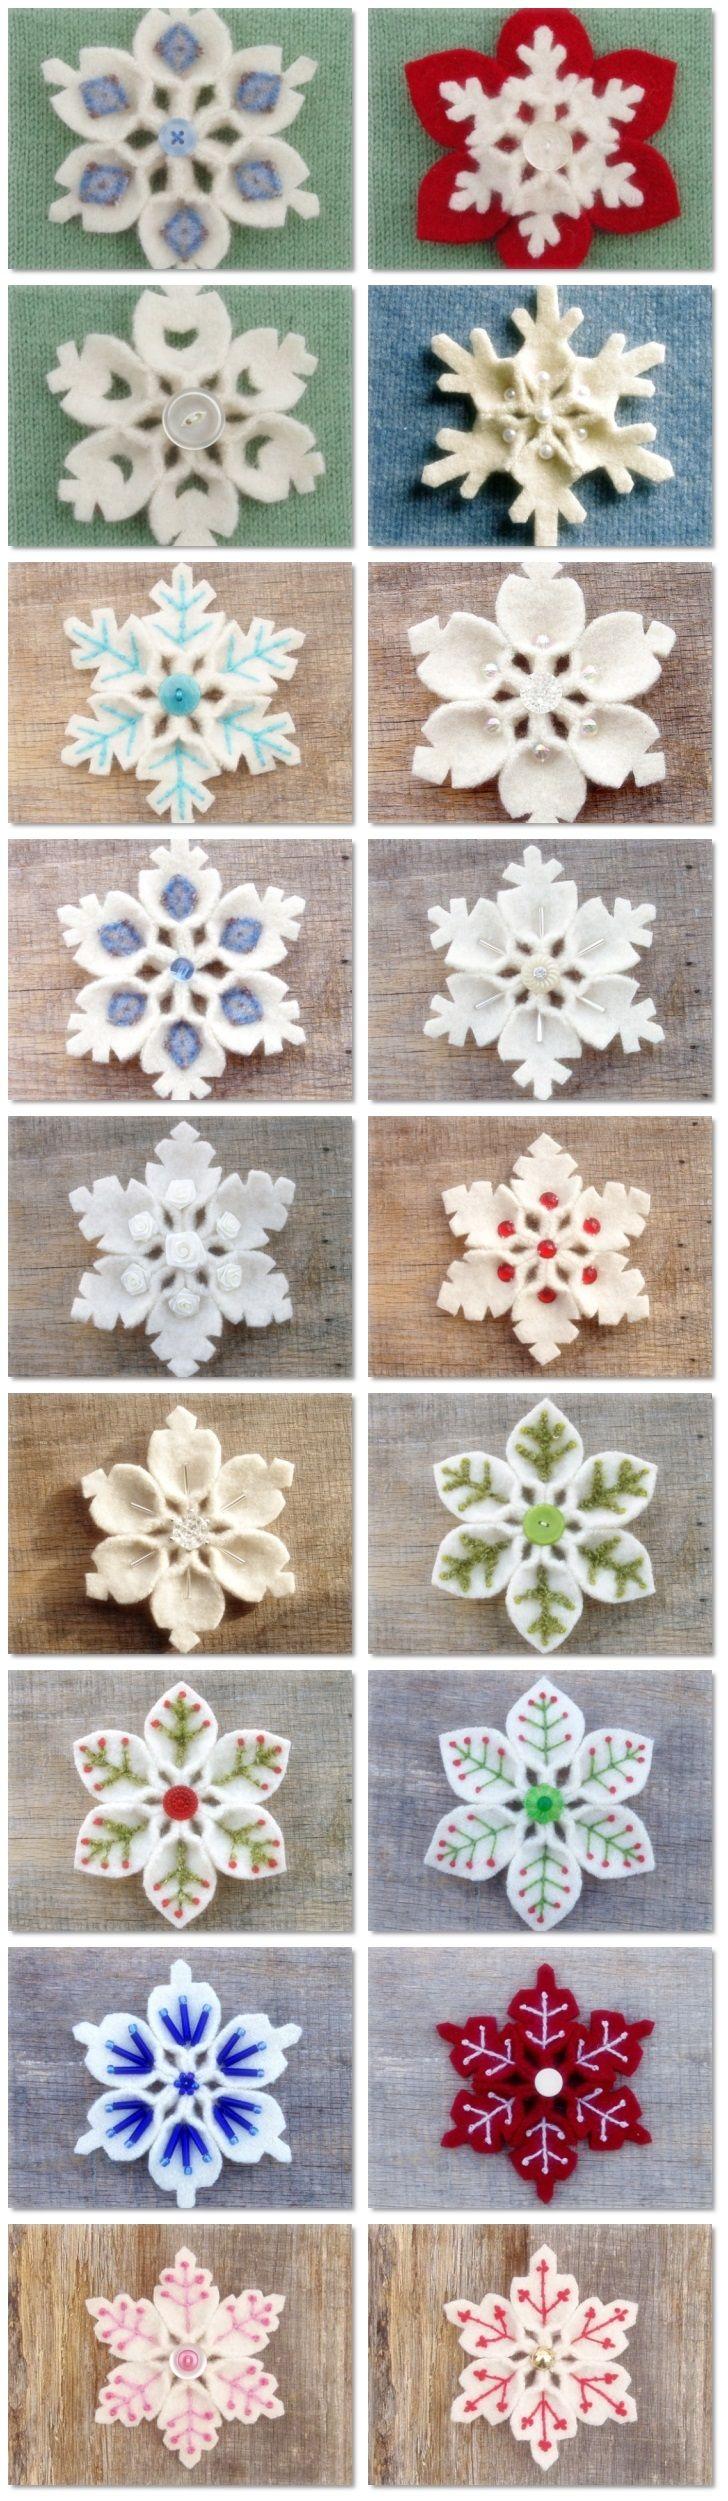 How To Make Felt Snowflake Diy Step By Step Tutorial Instruction Felt Christmas Ornaments Felt Christmas Christmas Diy